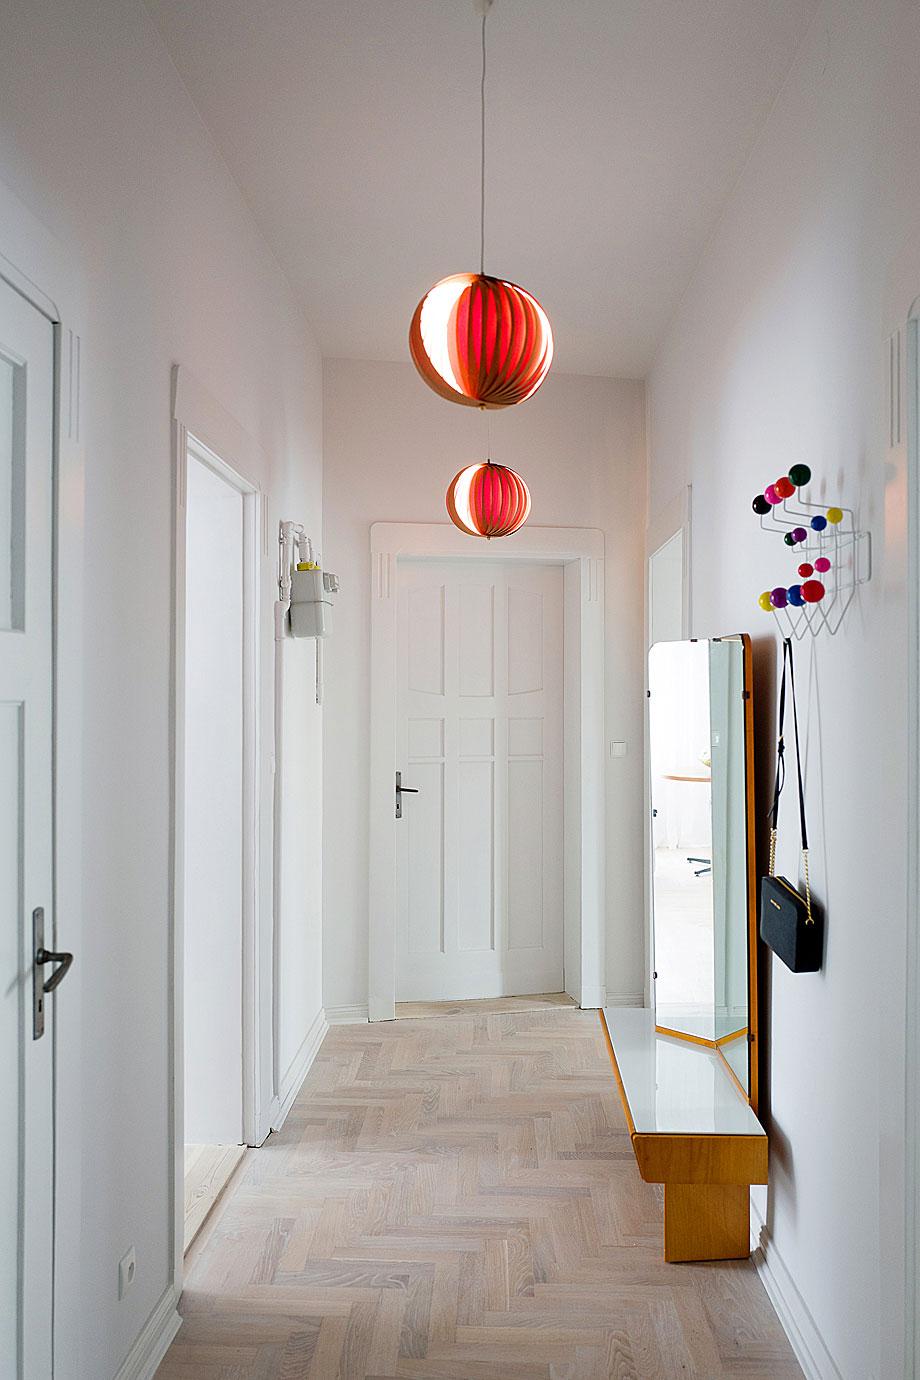 apartamento-tenement-loft-kolasinski (22)